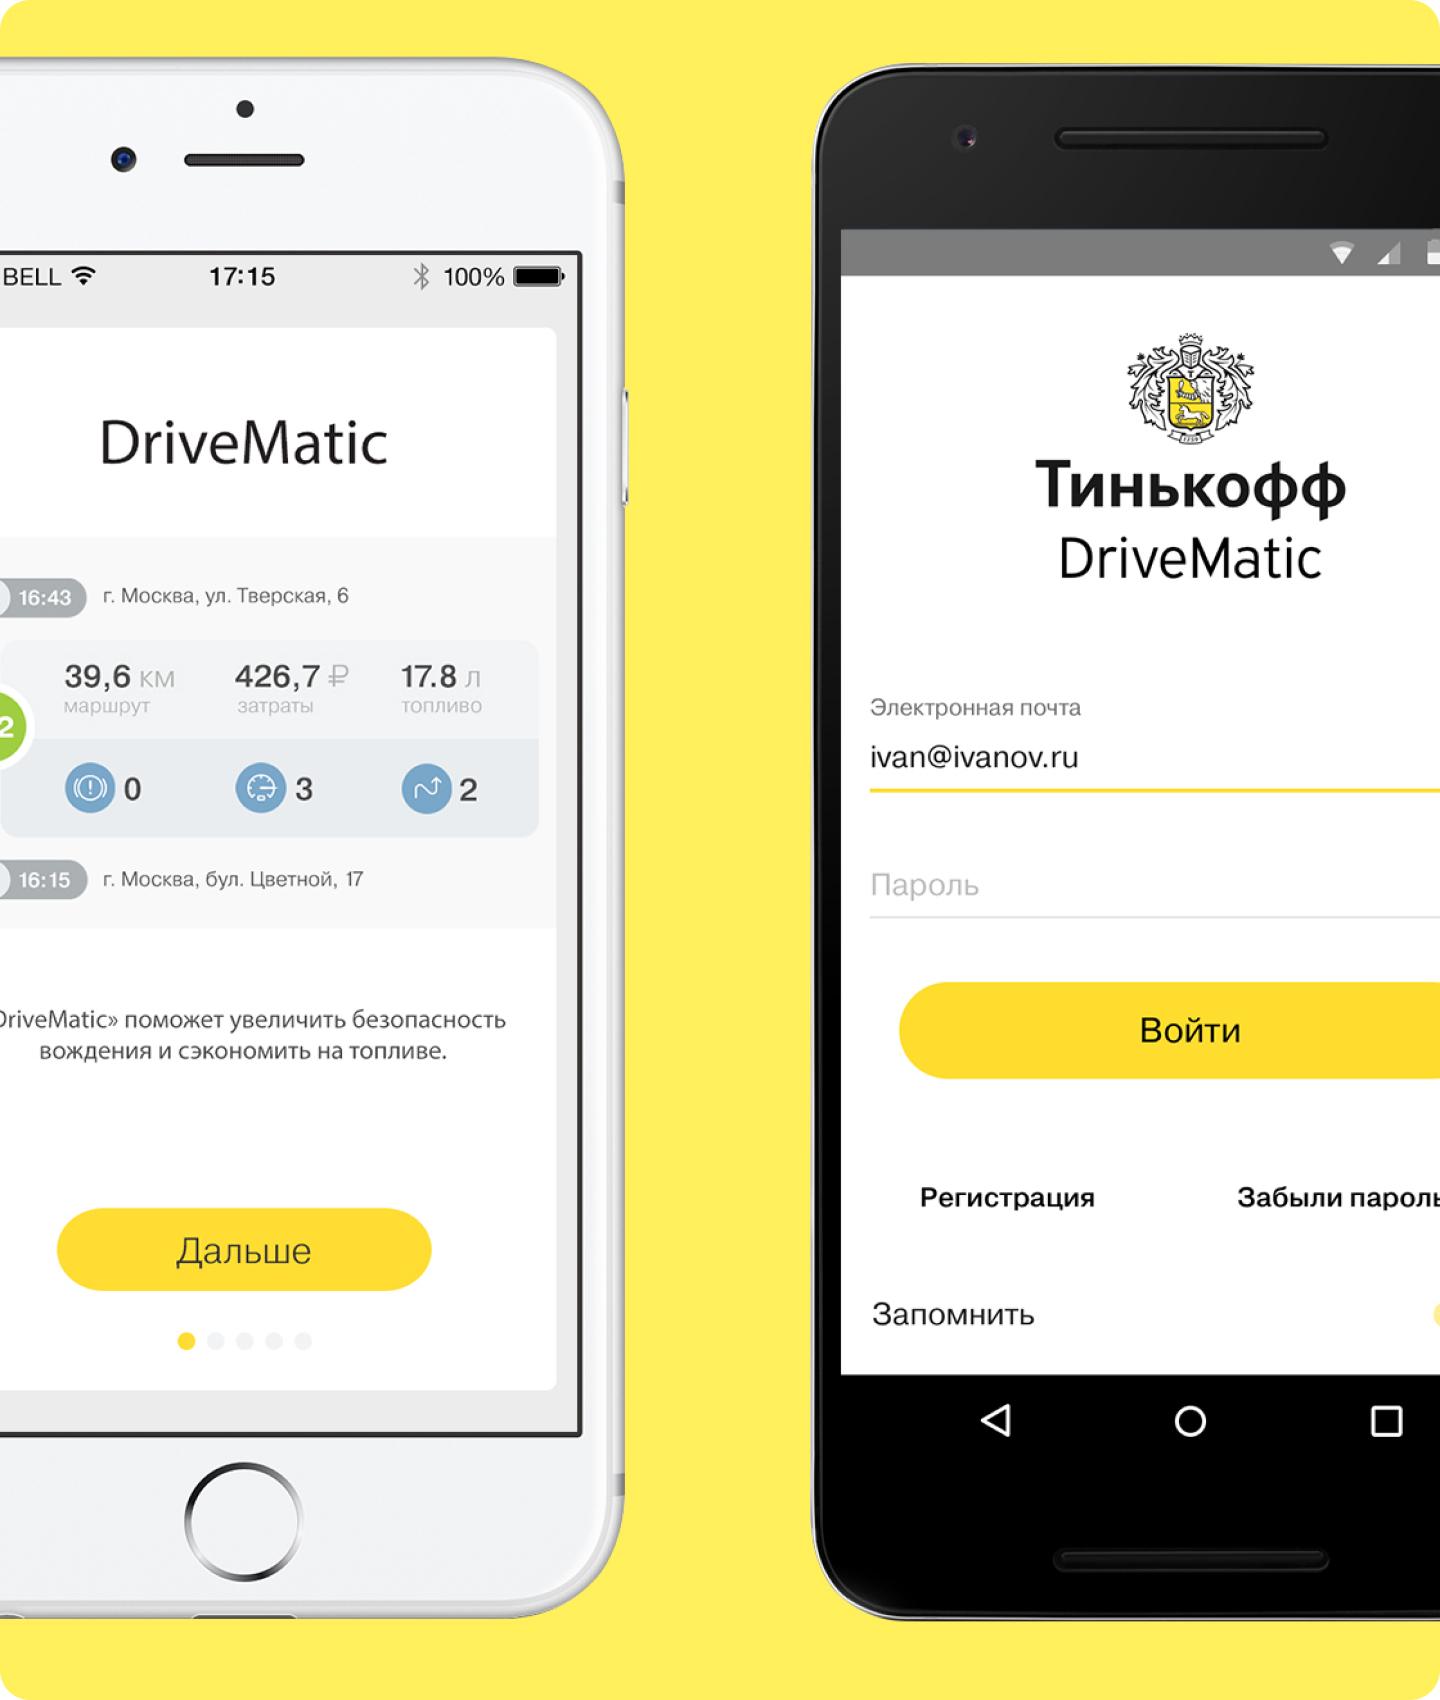 Тинькофф Drivematic